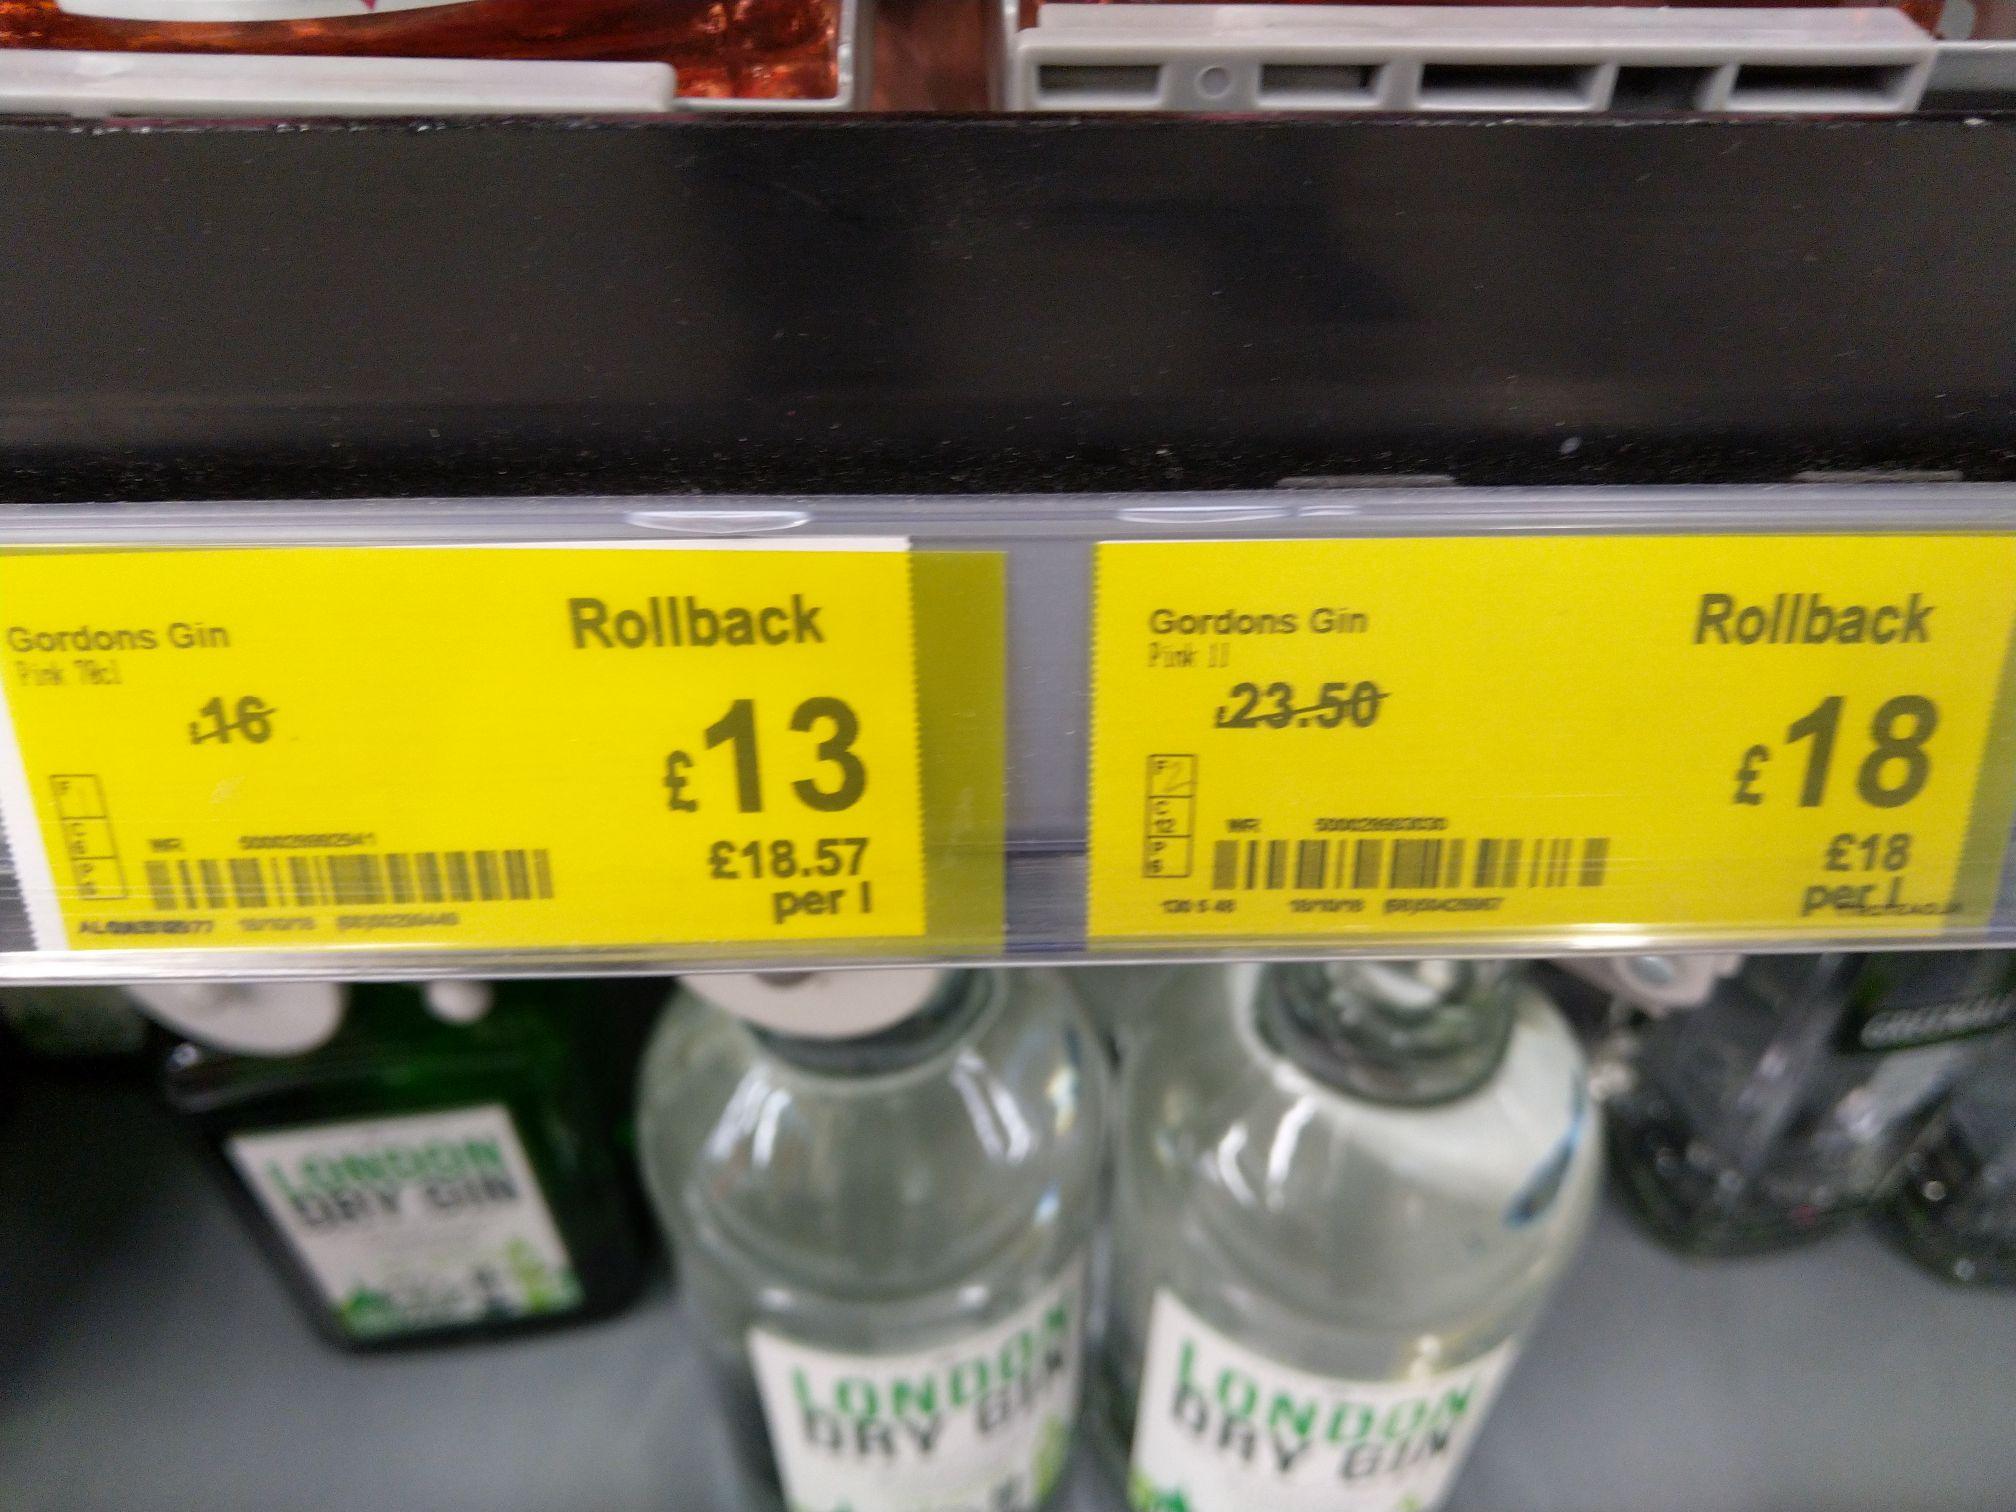 Gordon's pink gin 1L £18, 70 cl £13 - Asda